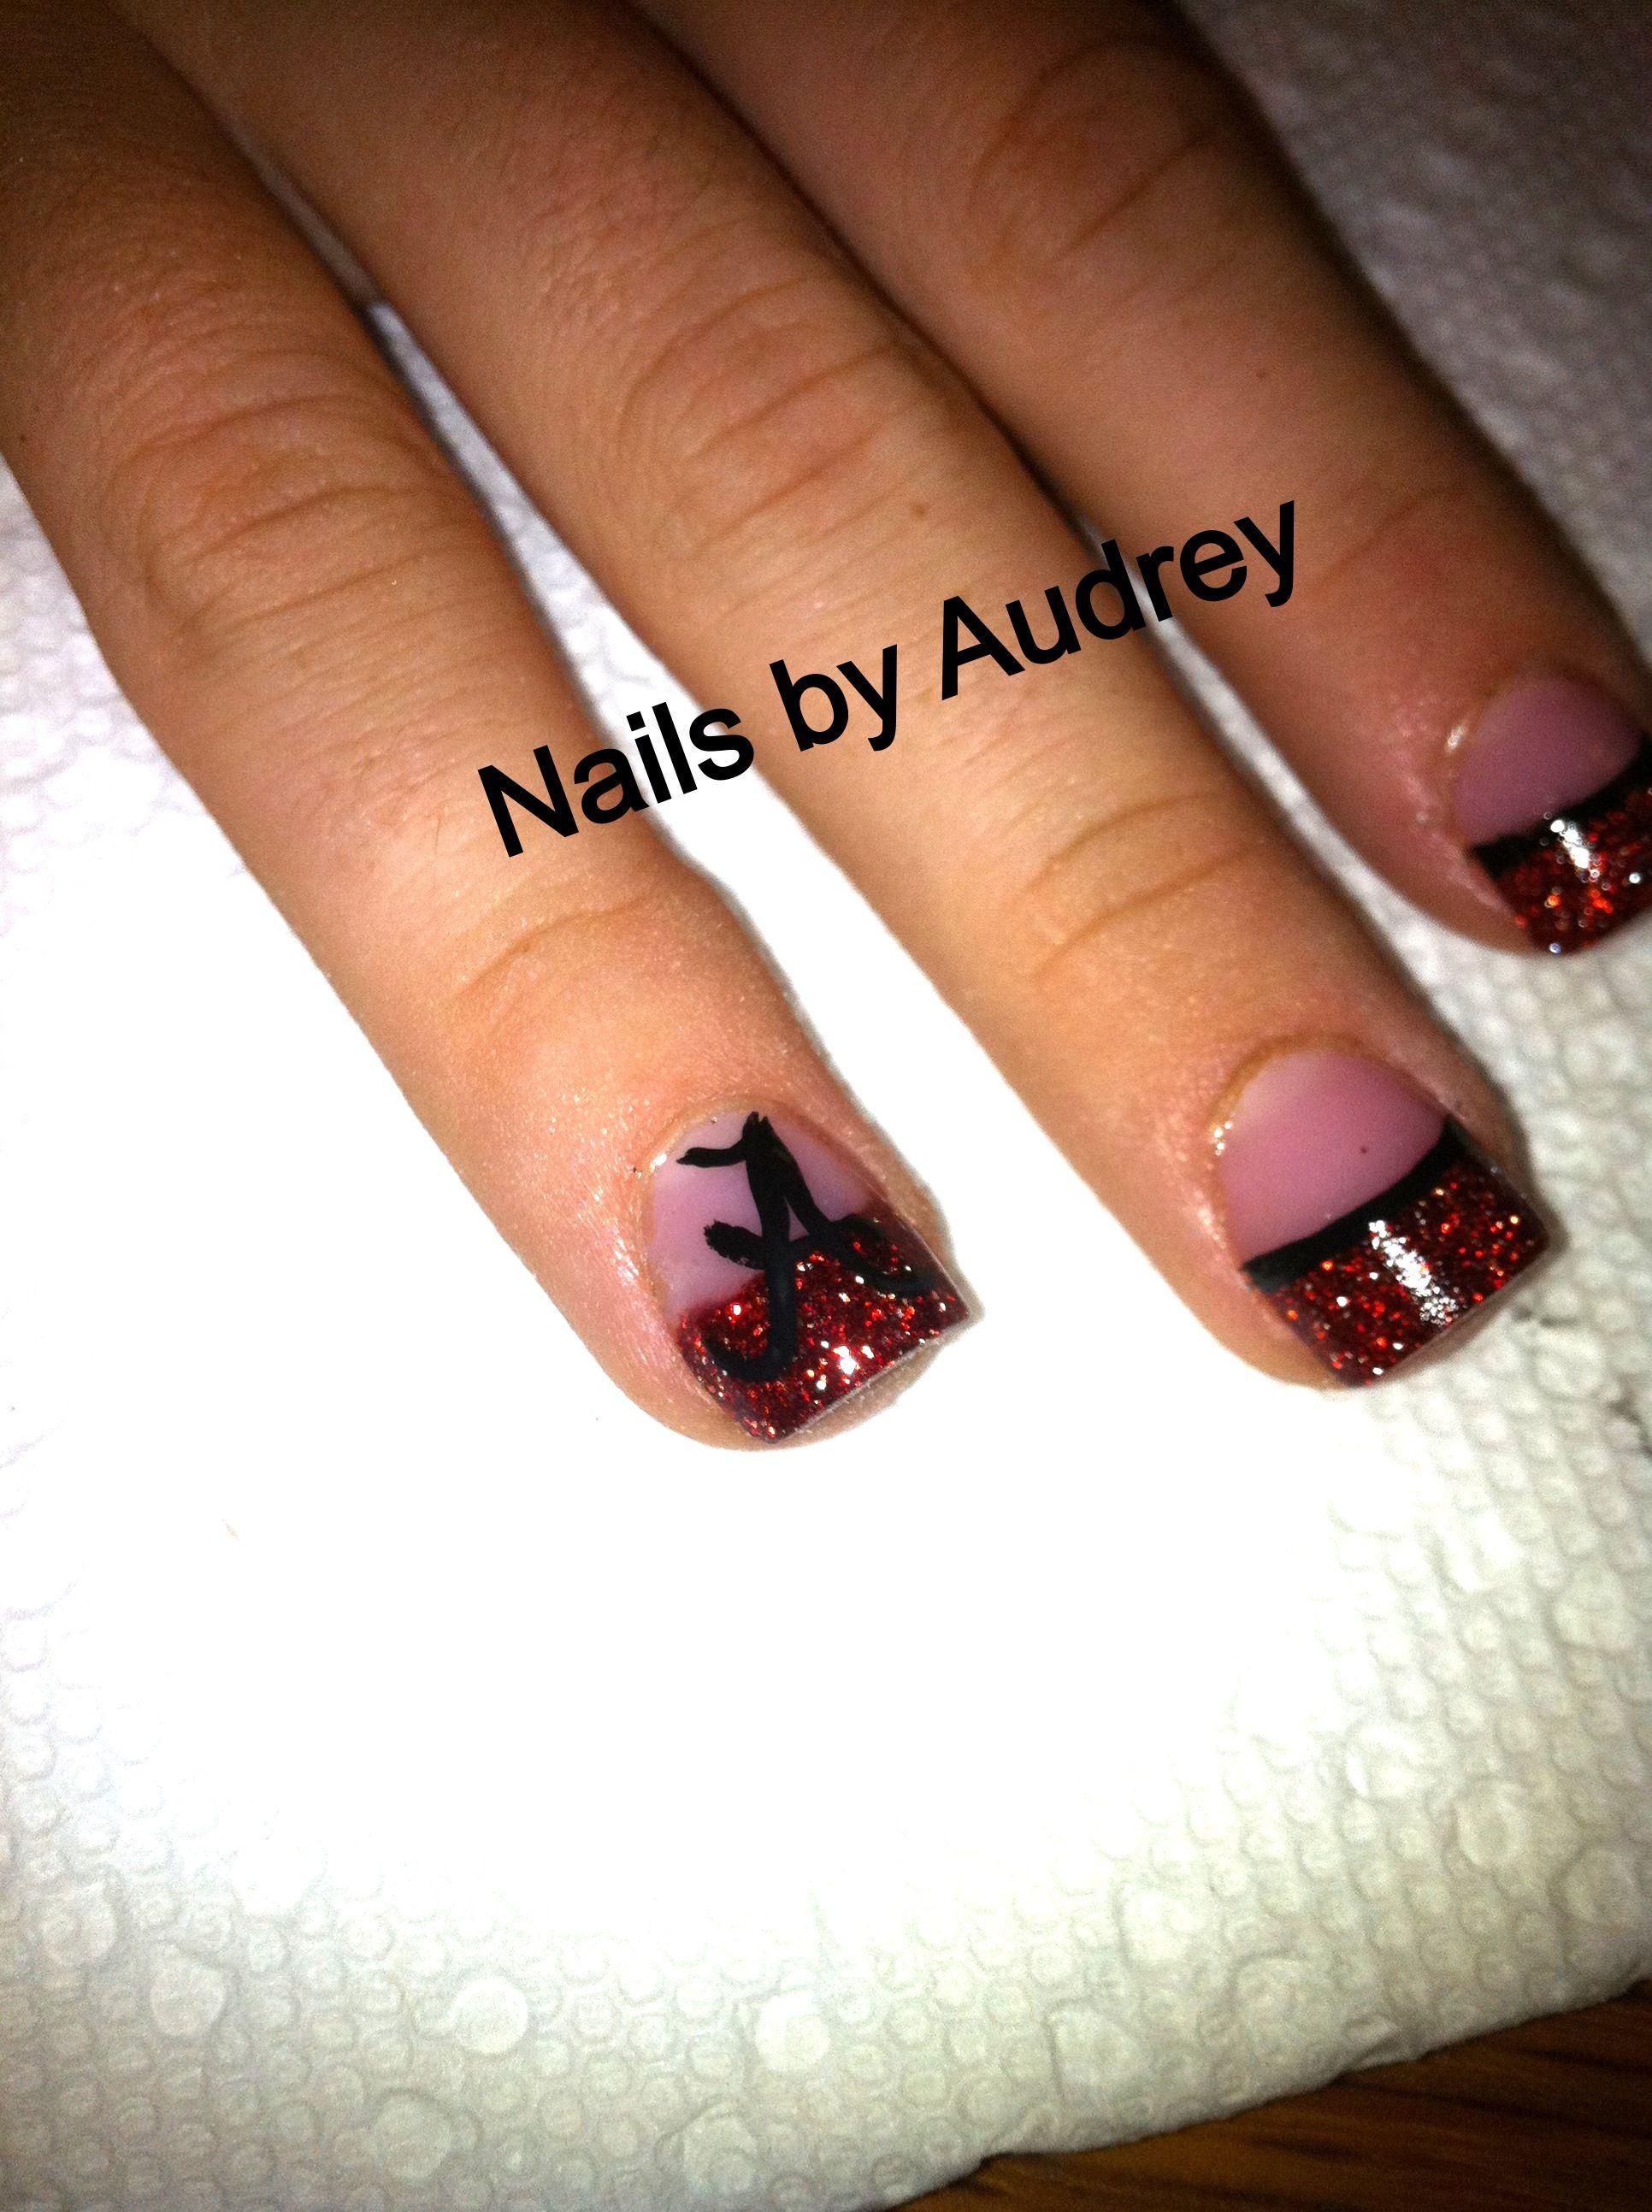 Alabama nails! | Nails By: Audrey! :) | Pinterest ...